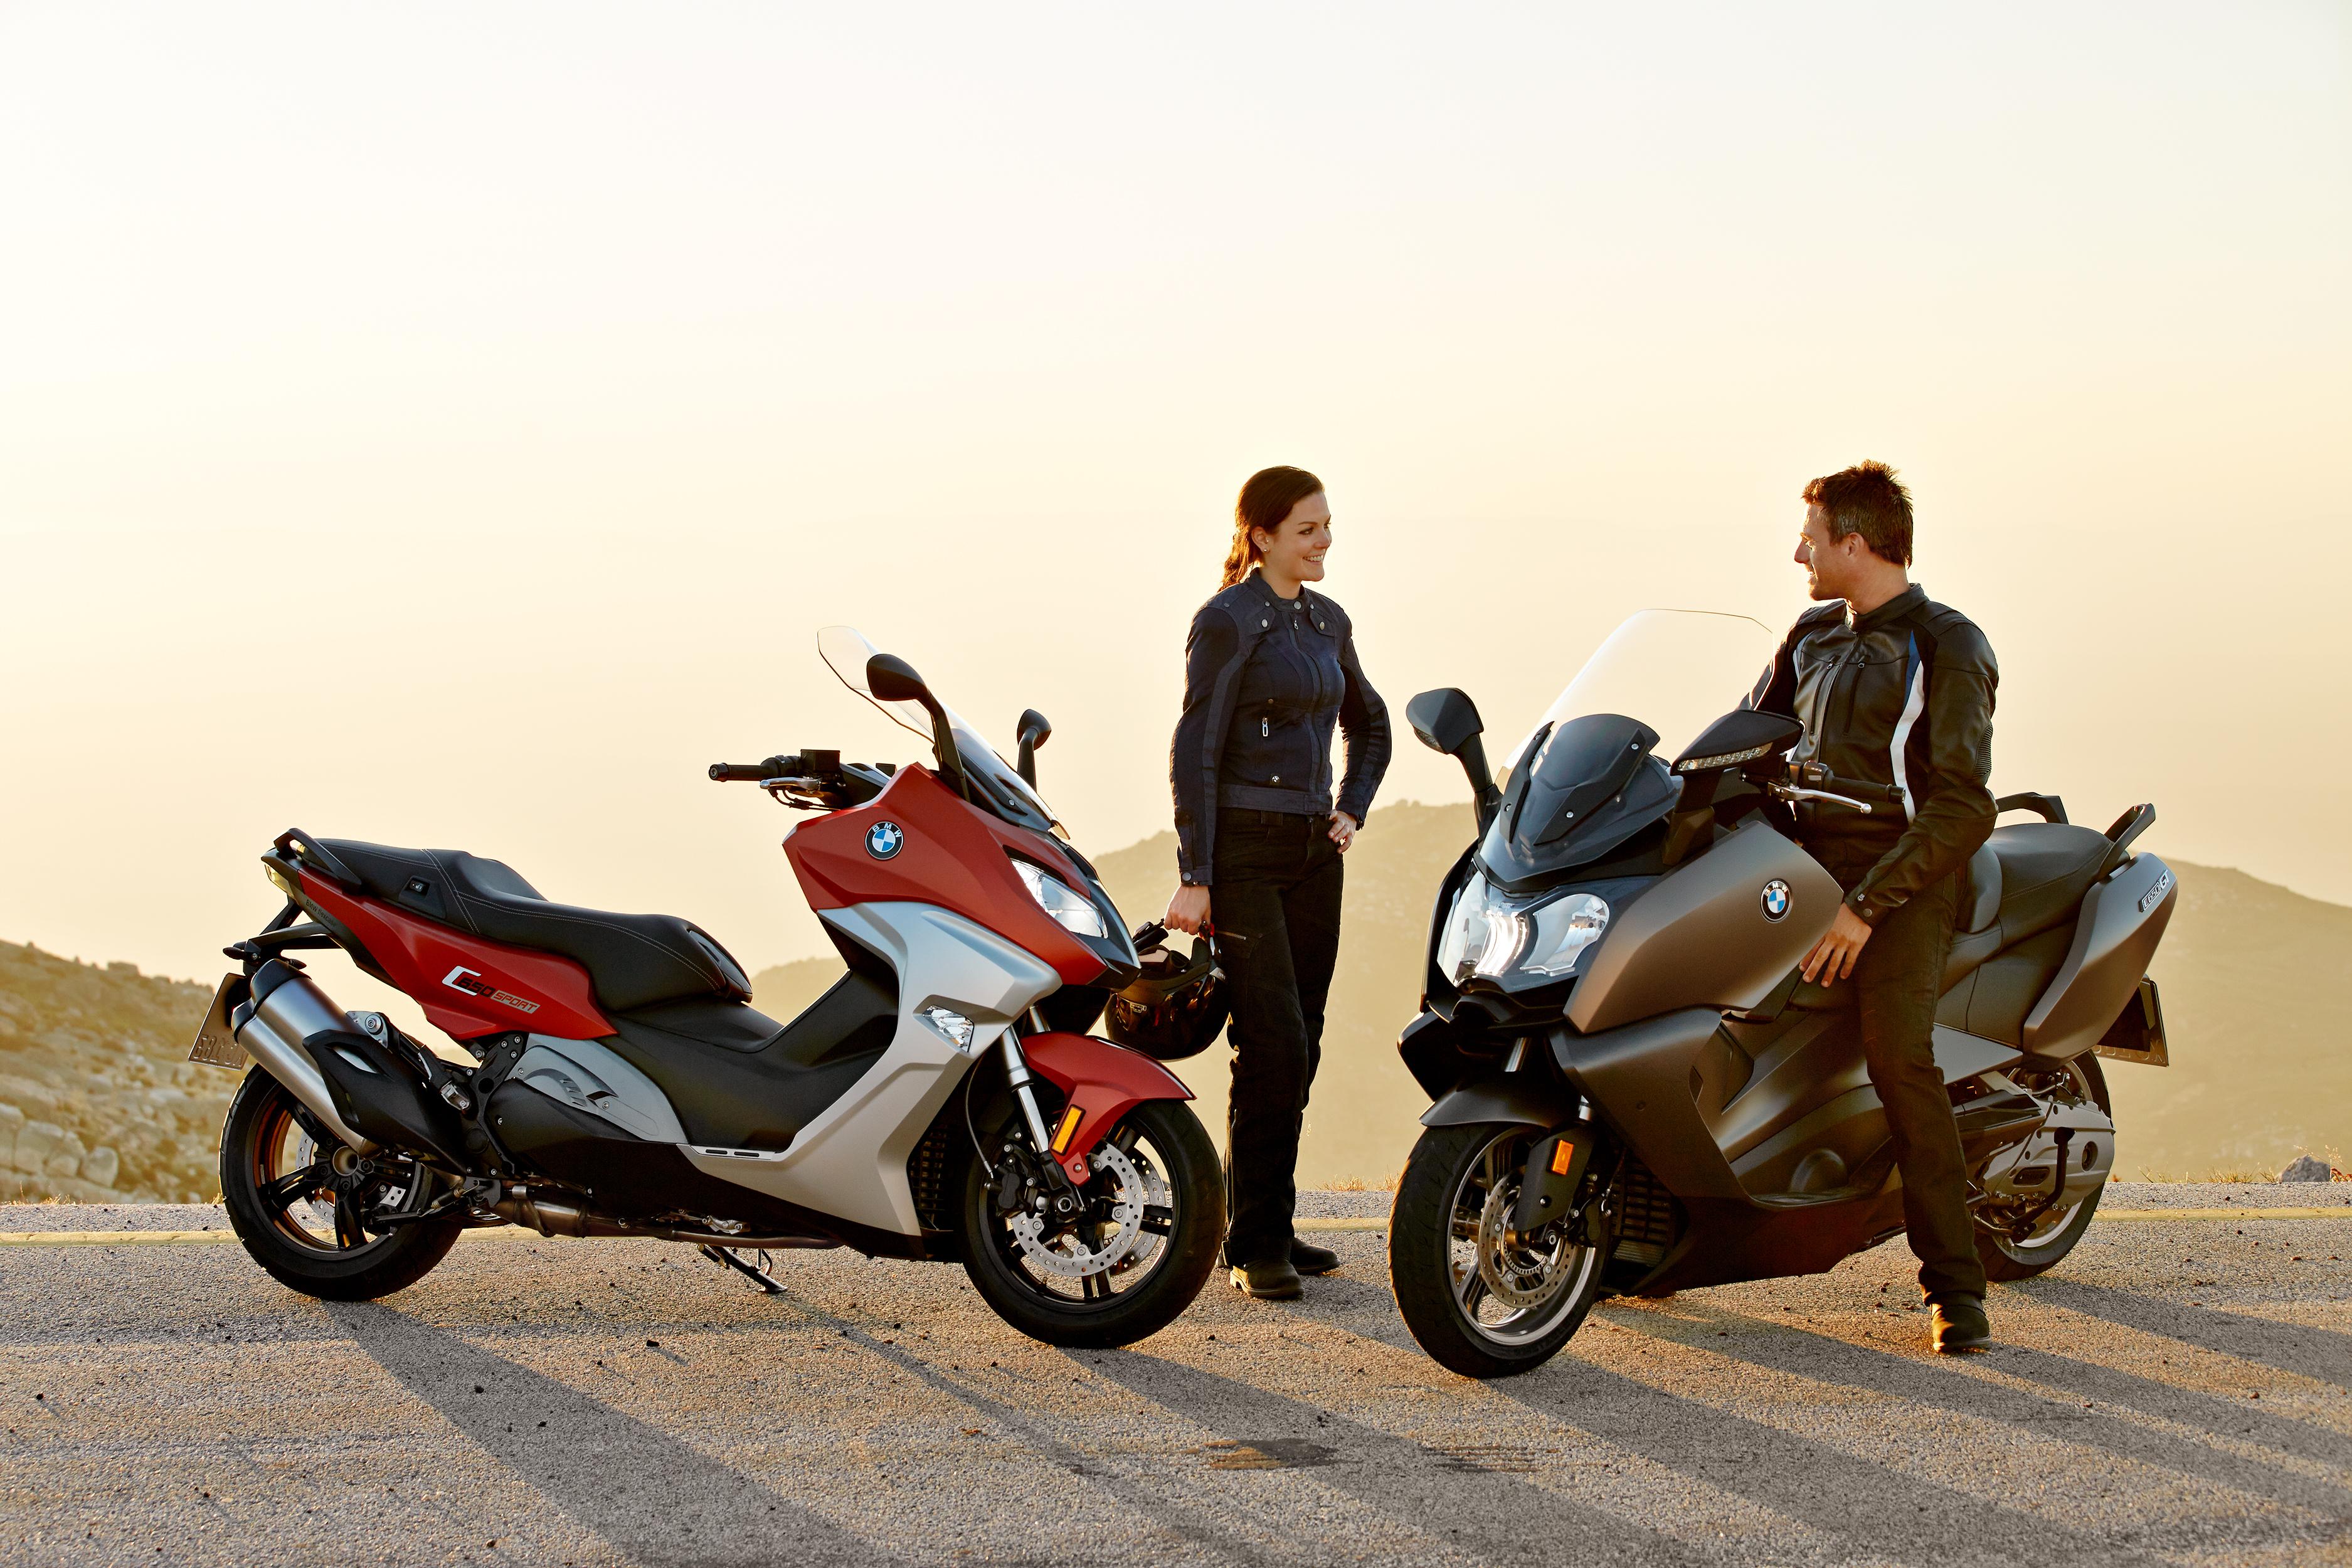 BMW Motorrad - Σχέδια για ηλεκτροκίνητη μοτοσυκλέτα - BIKEIT!